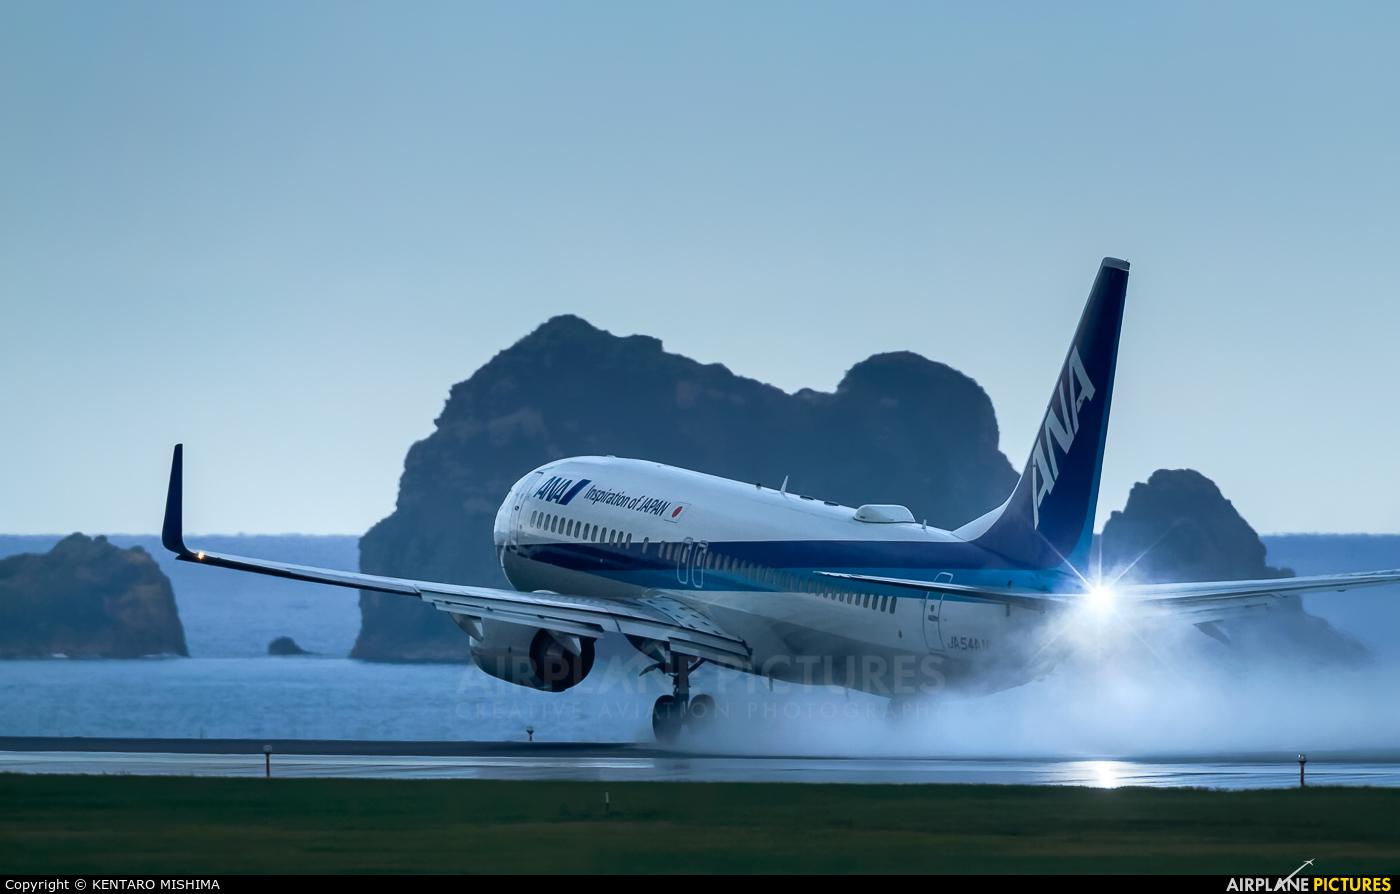 ANA - All Nippon Airways JA54AN aircraft at Tottori